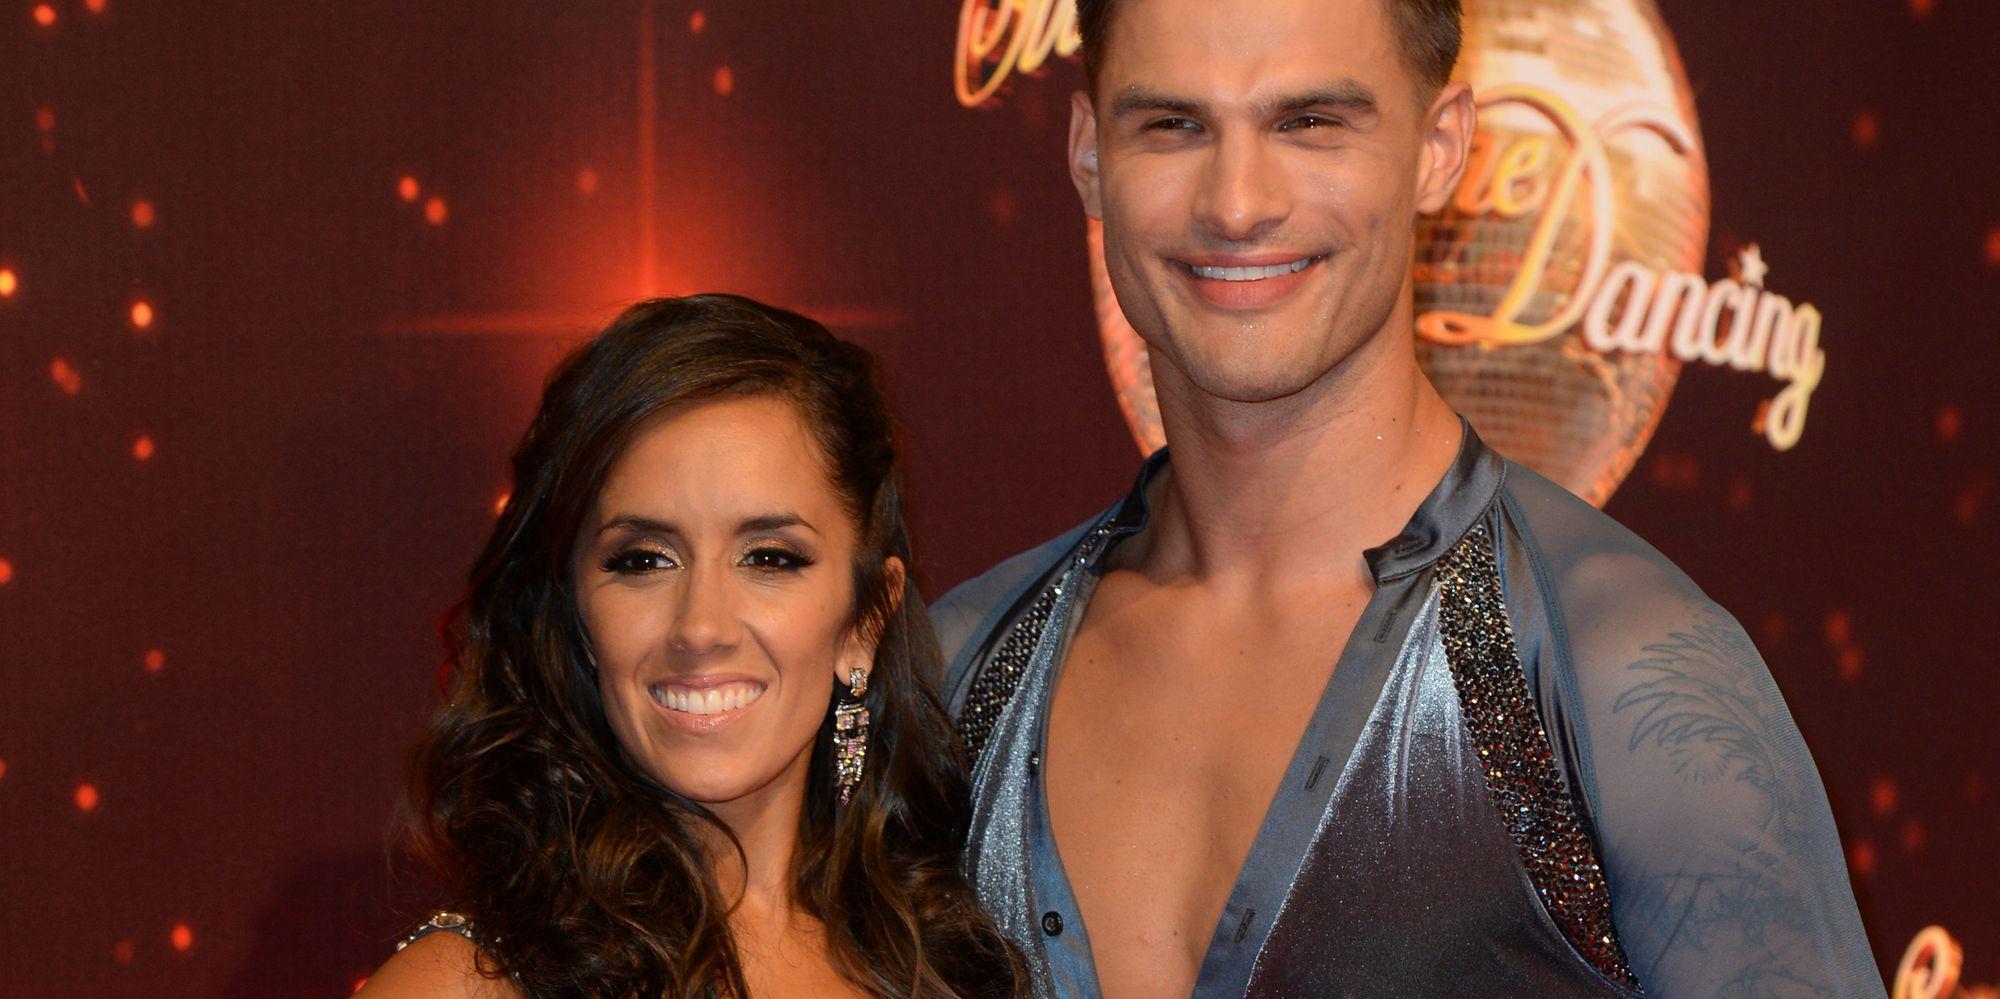 'Strictly Come Dancing' Pros  Janette Marara And Aljaz Skorjanec Wed In Star-Studded Ceremony